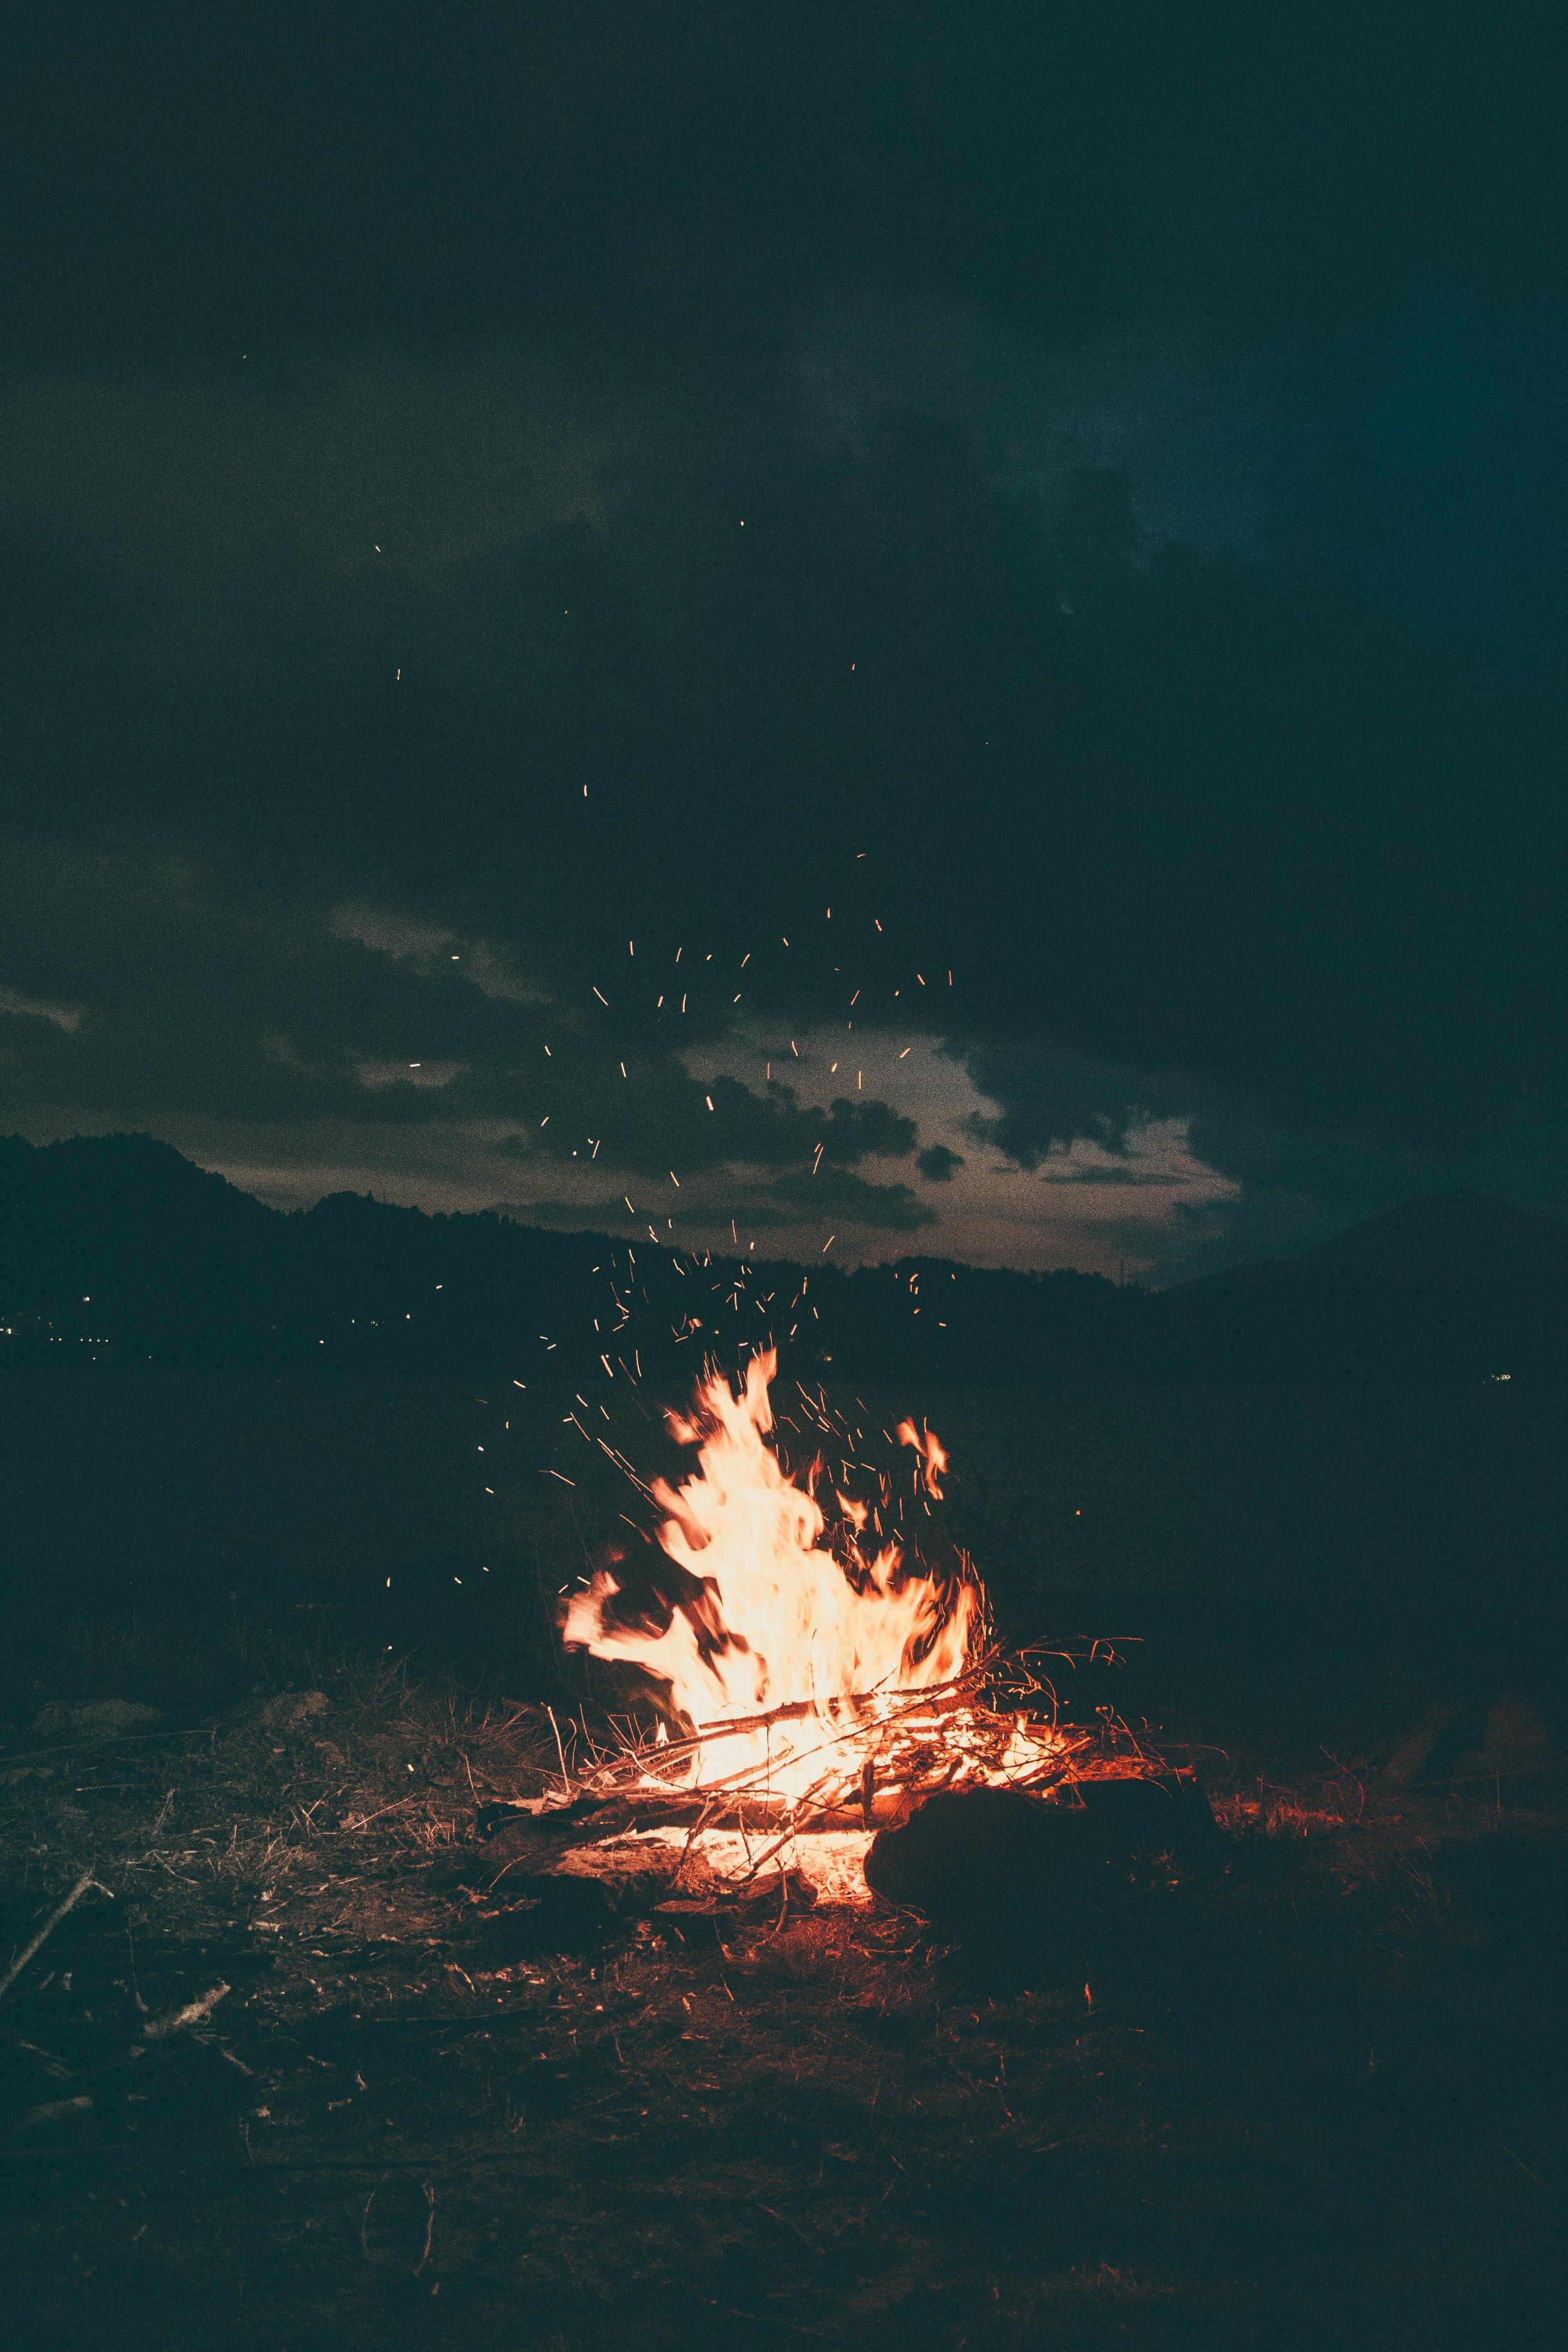 bonfire-burning-camp-1368382.jpg